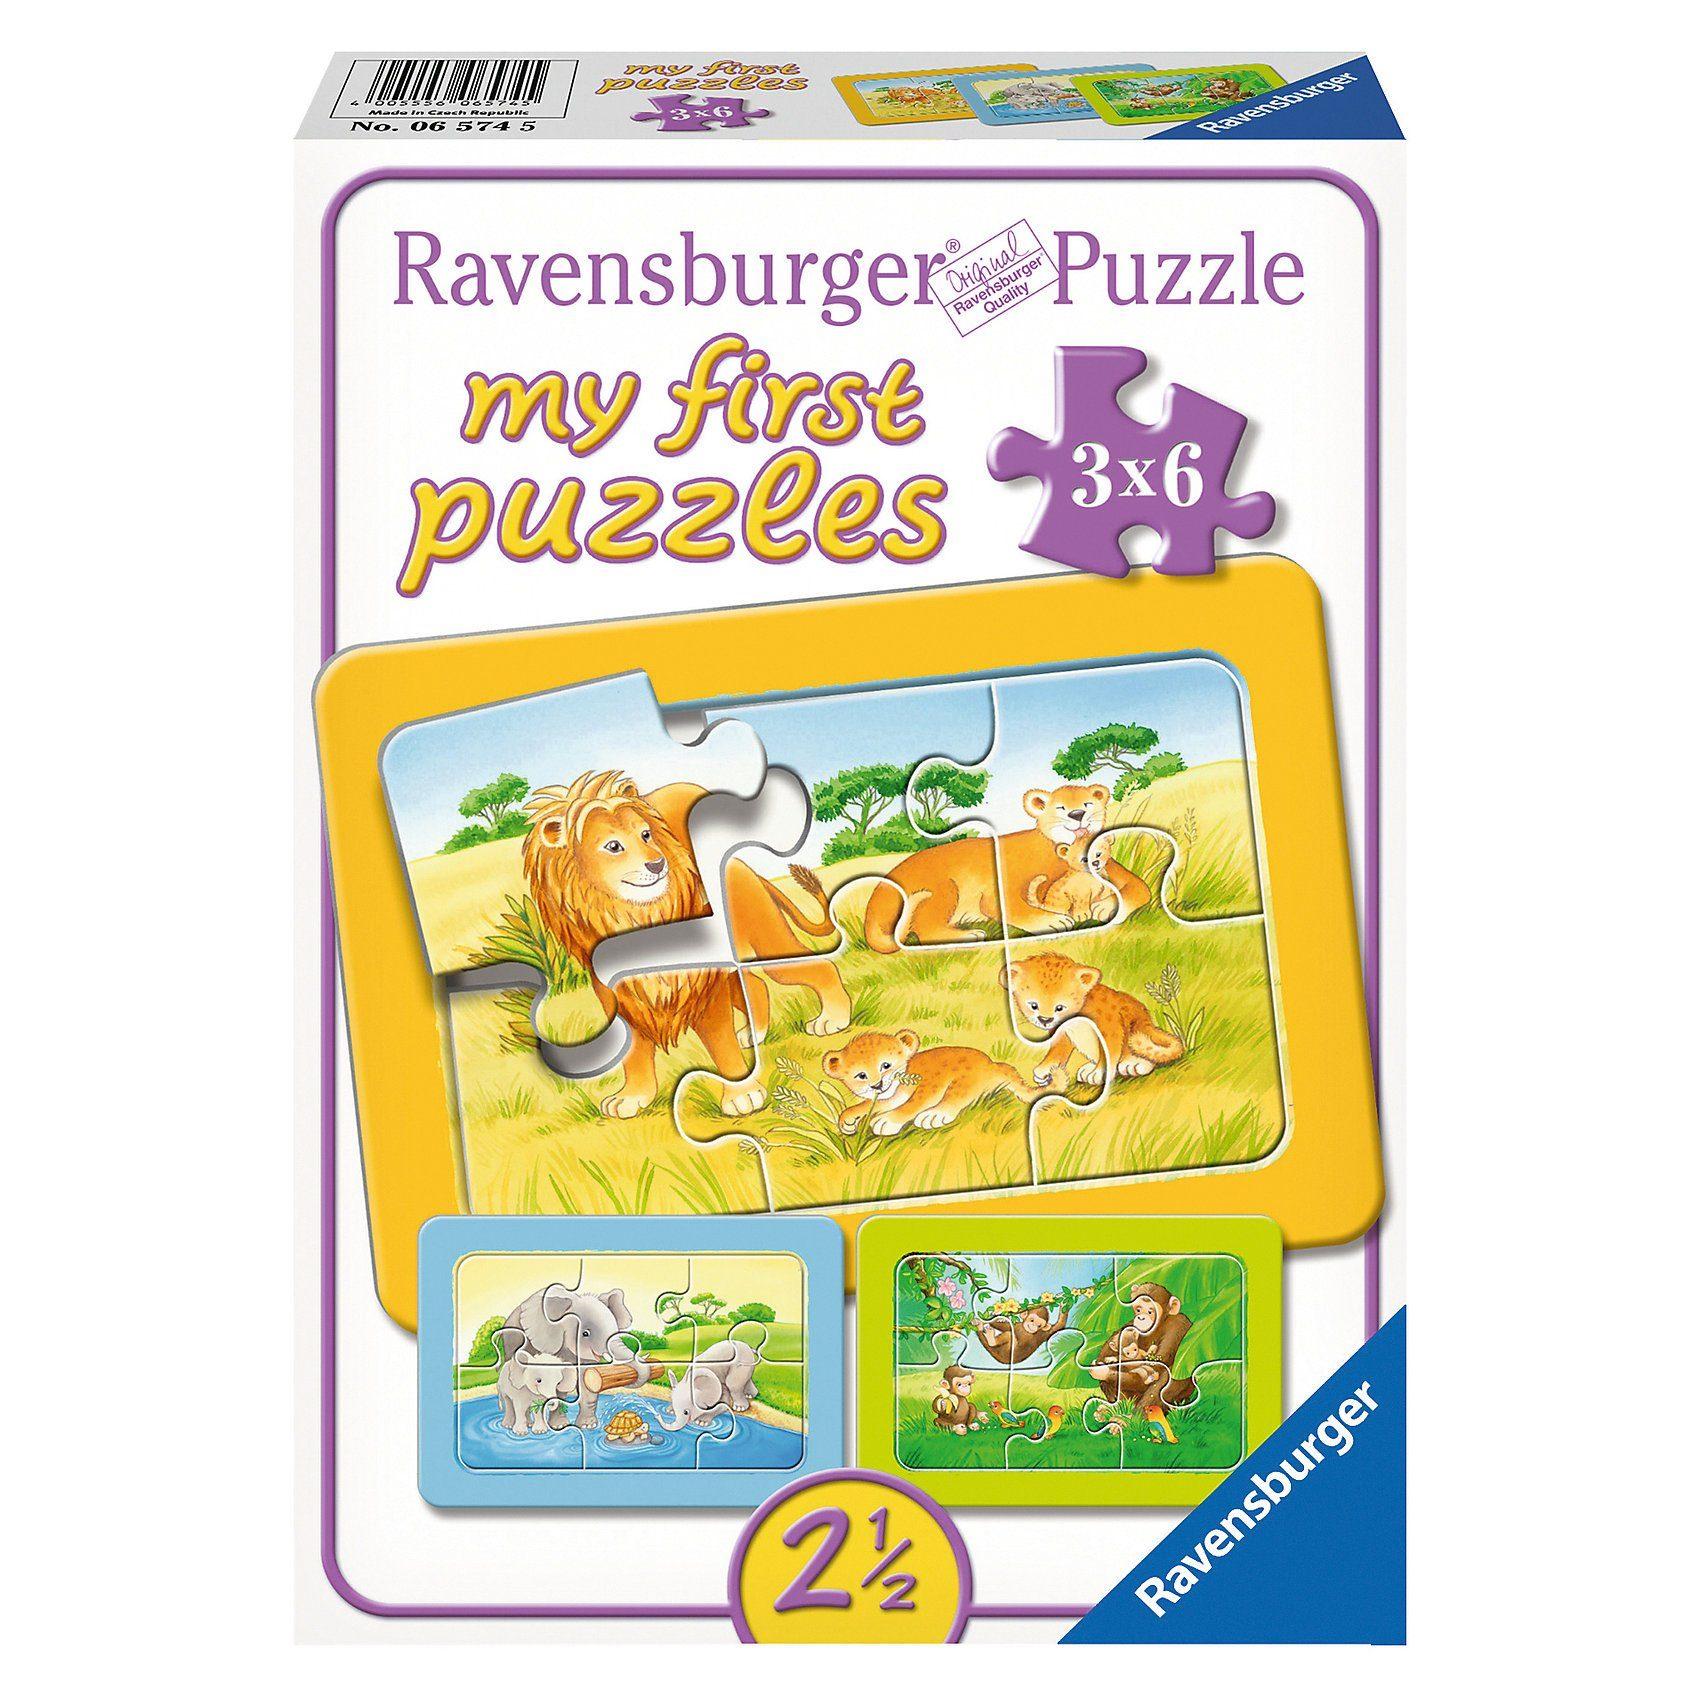 Ravensburger My first Puzzles - Rahmenpuzzle Affe, Elefant und Löwe